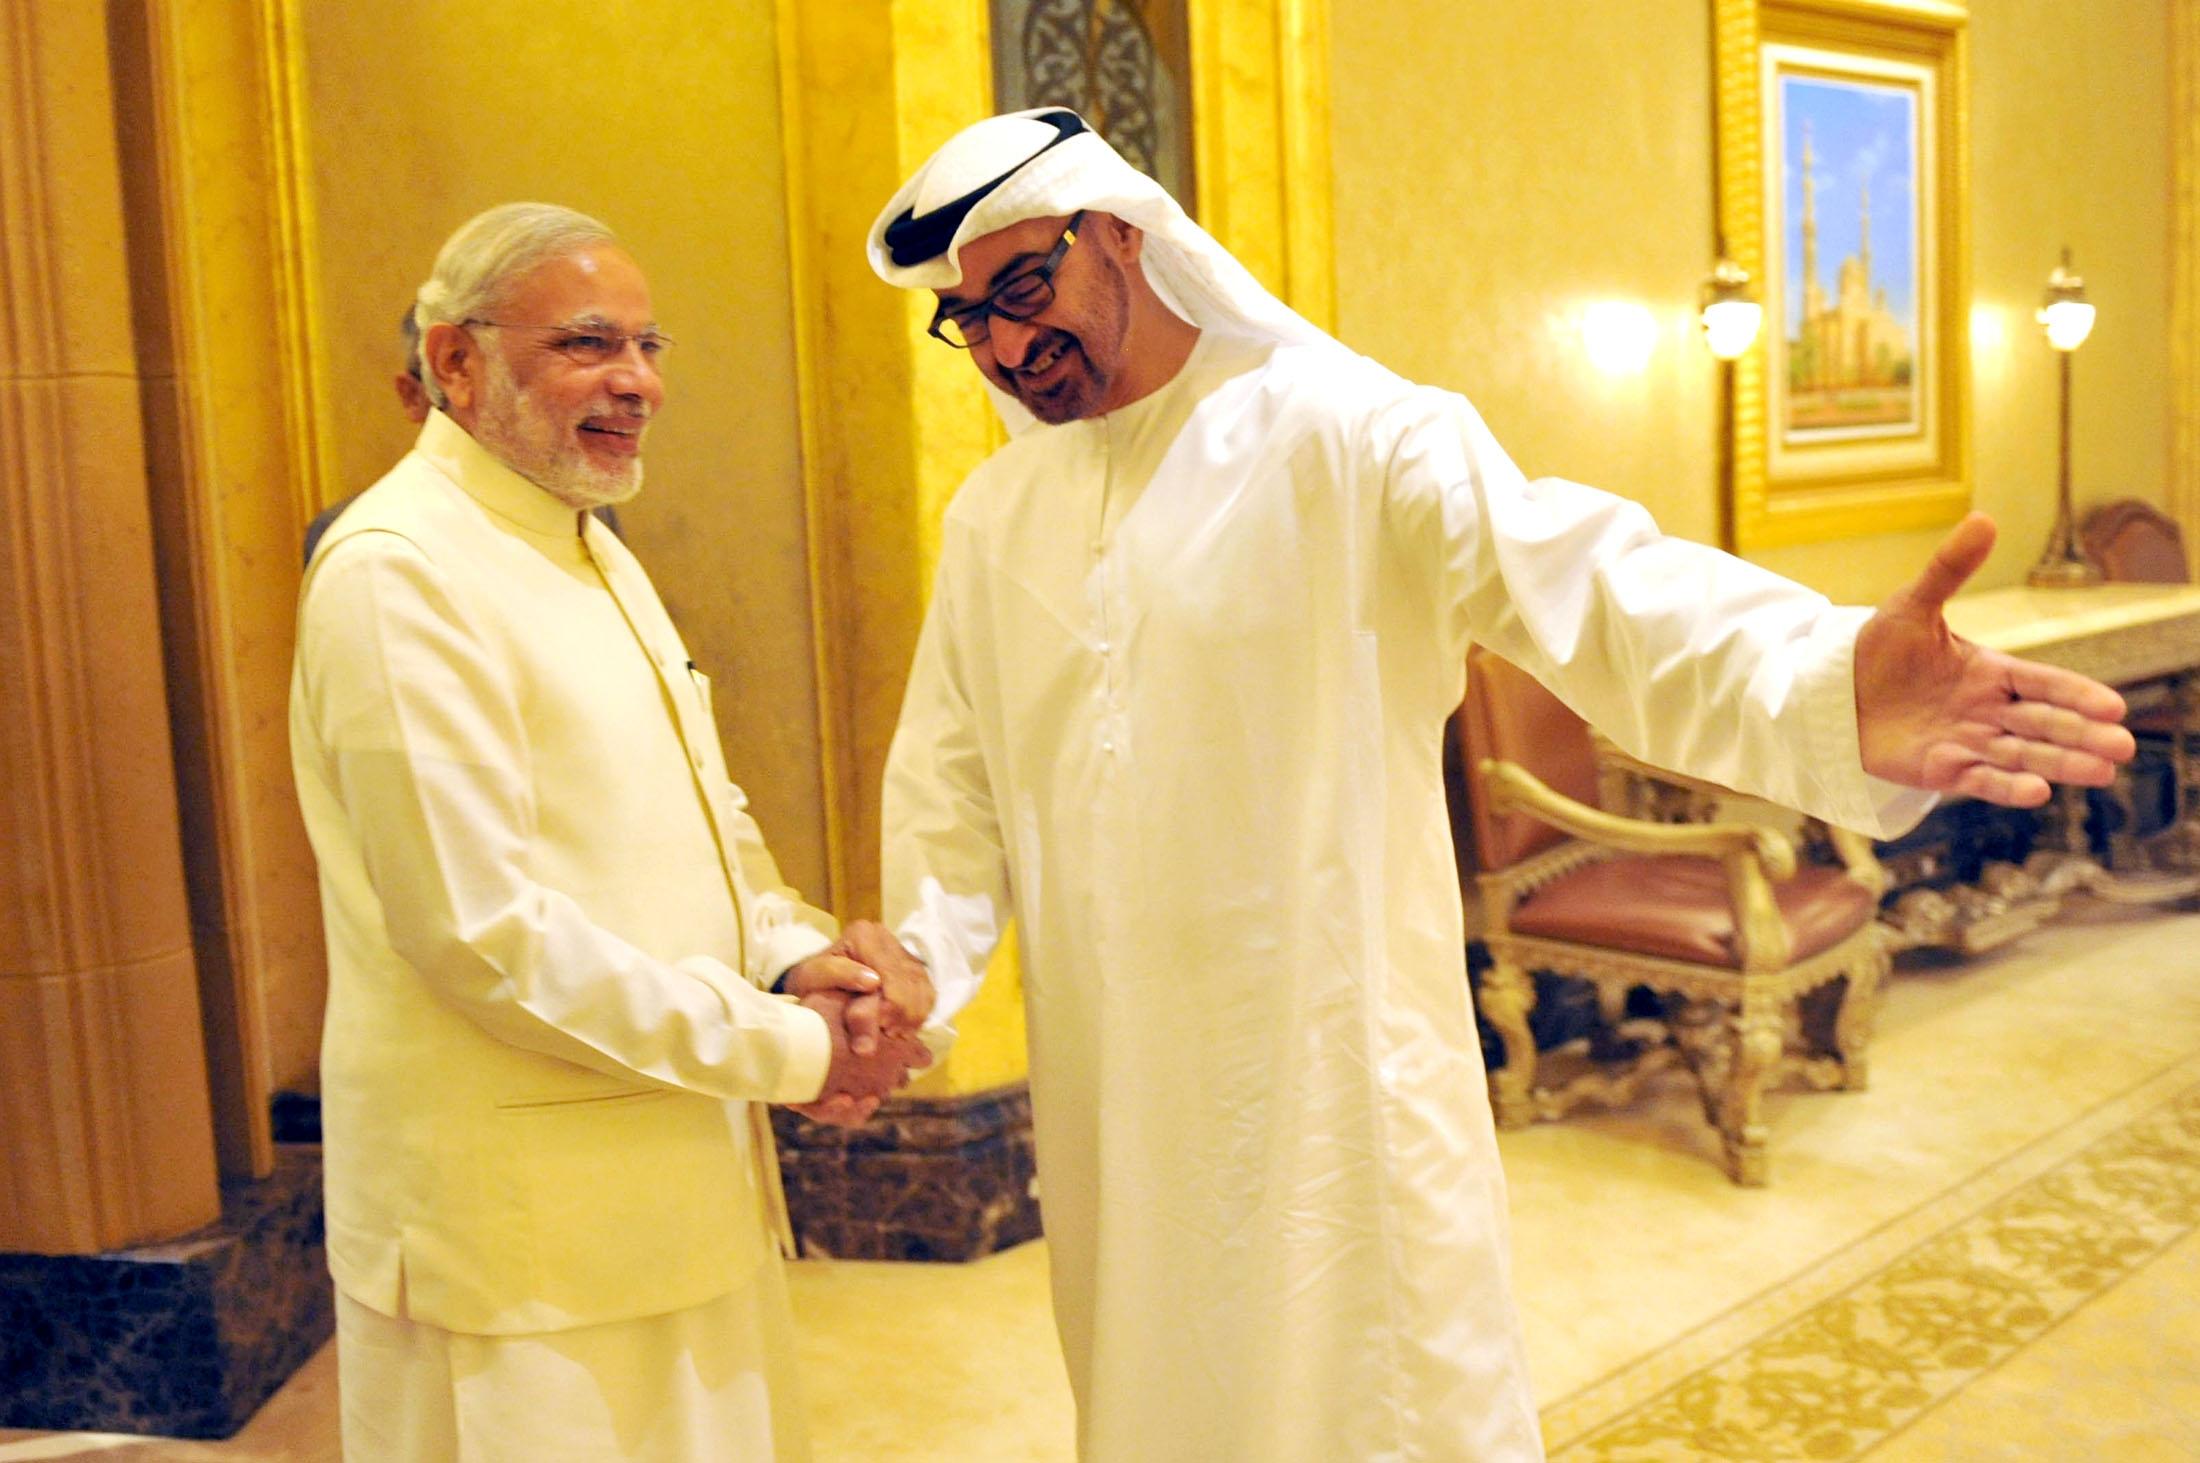 Narendra Modi with Abu Dhabi Crown Prince Shaikh Mohammed bin Zayed in Abu Dhabi in 2015. Photo credit: IANS